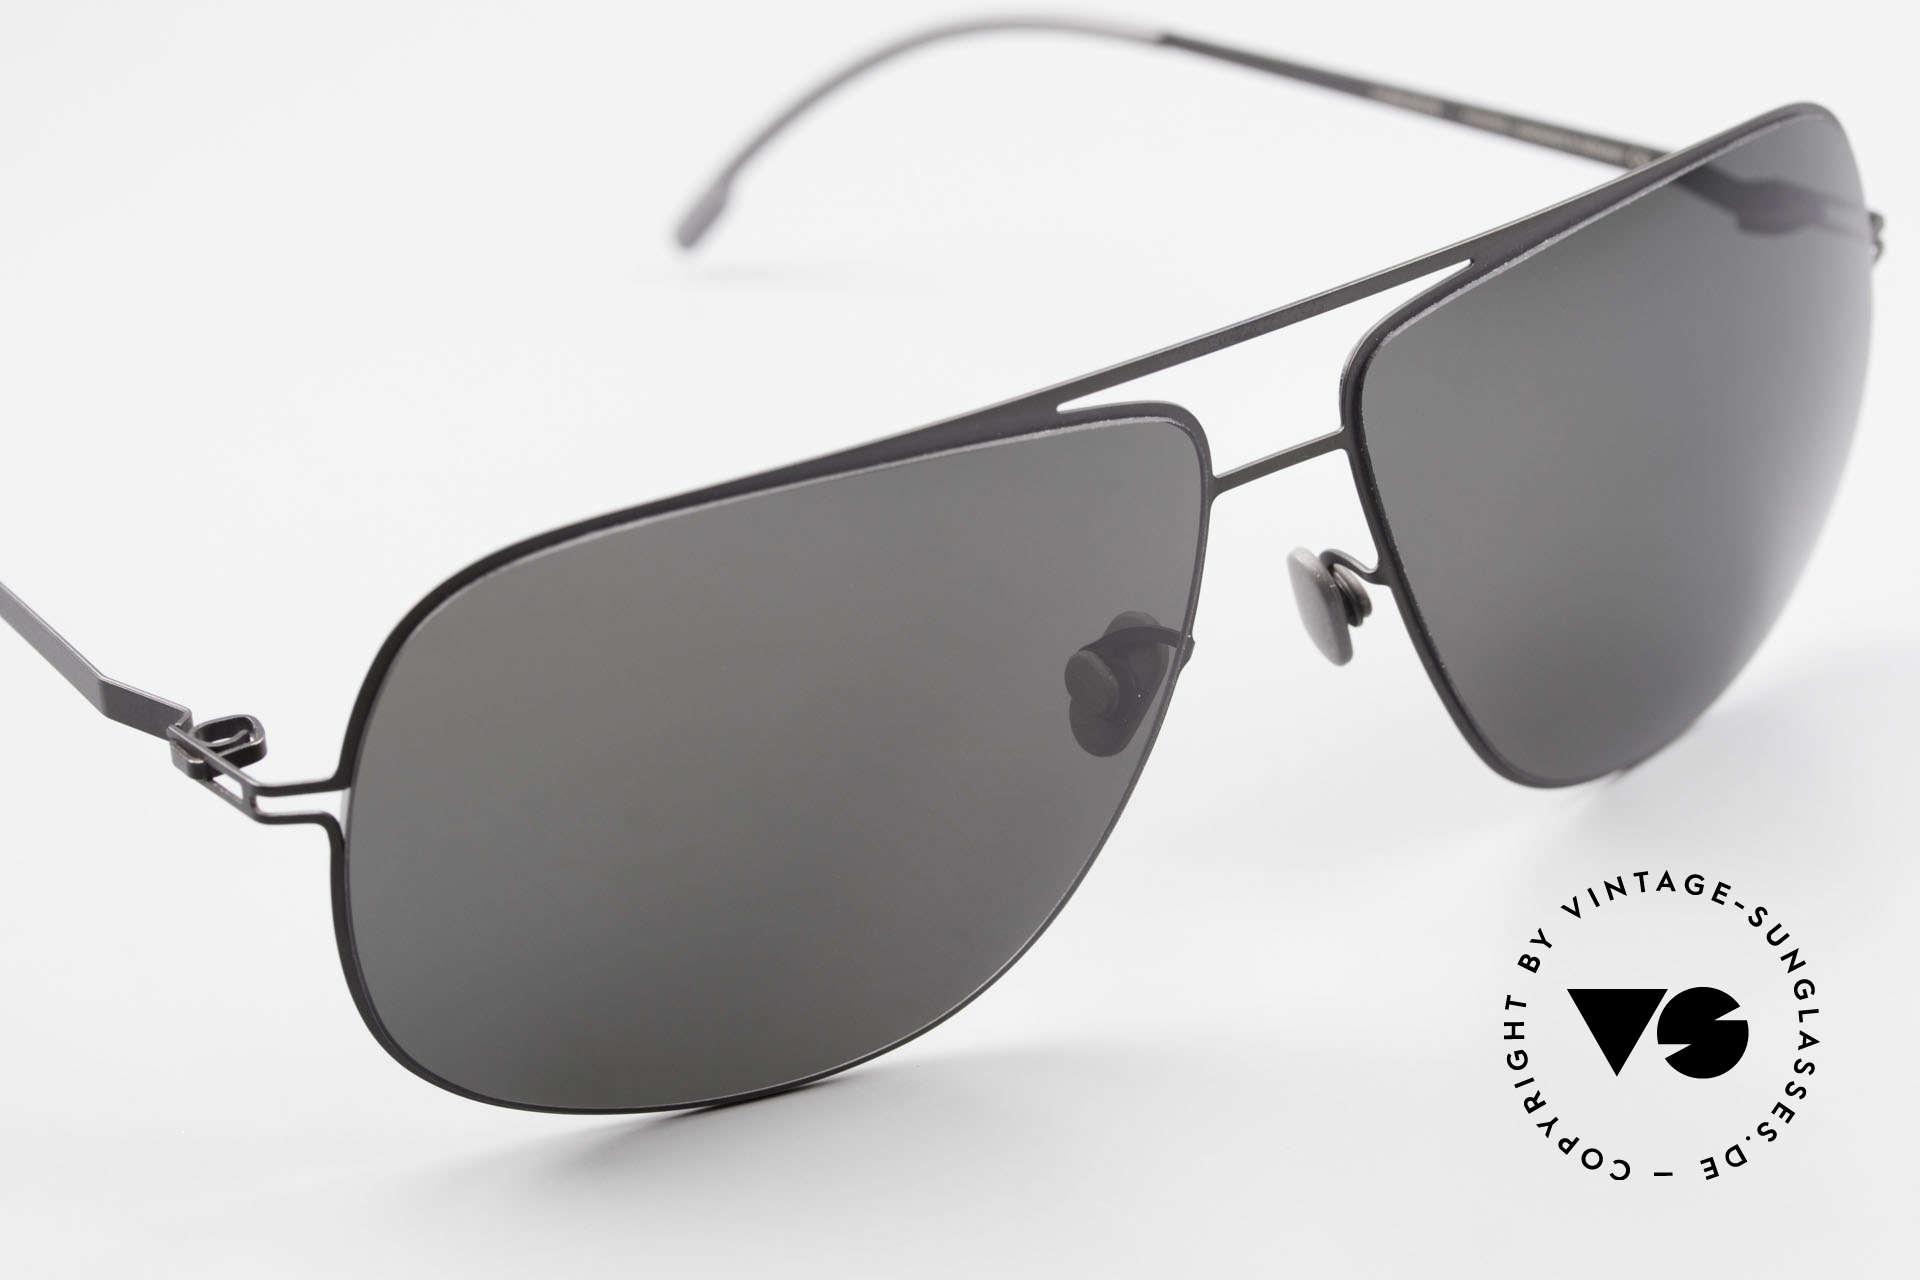 Mykita Jon Lite Metal Designer Sunglasses, top-notch quality, made in Germany (Berlin-Kreuzberg), Made for Men and Women